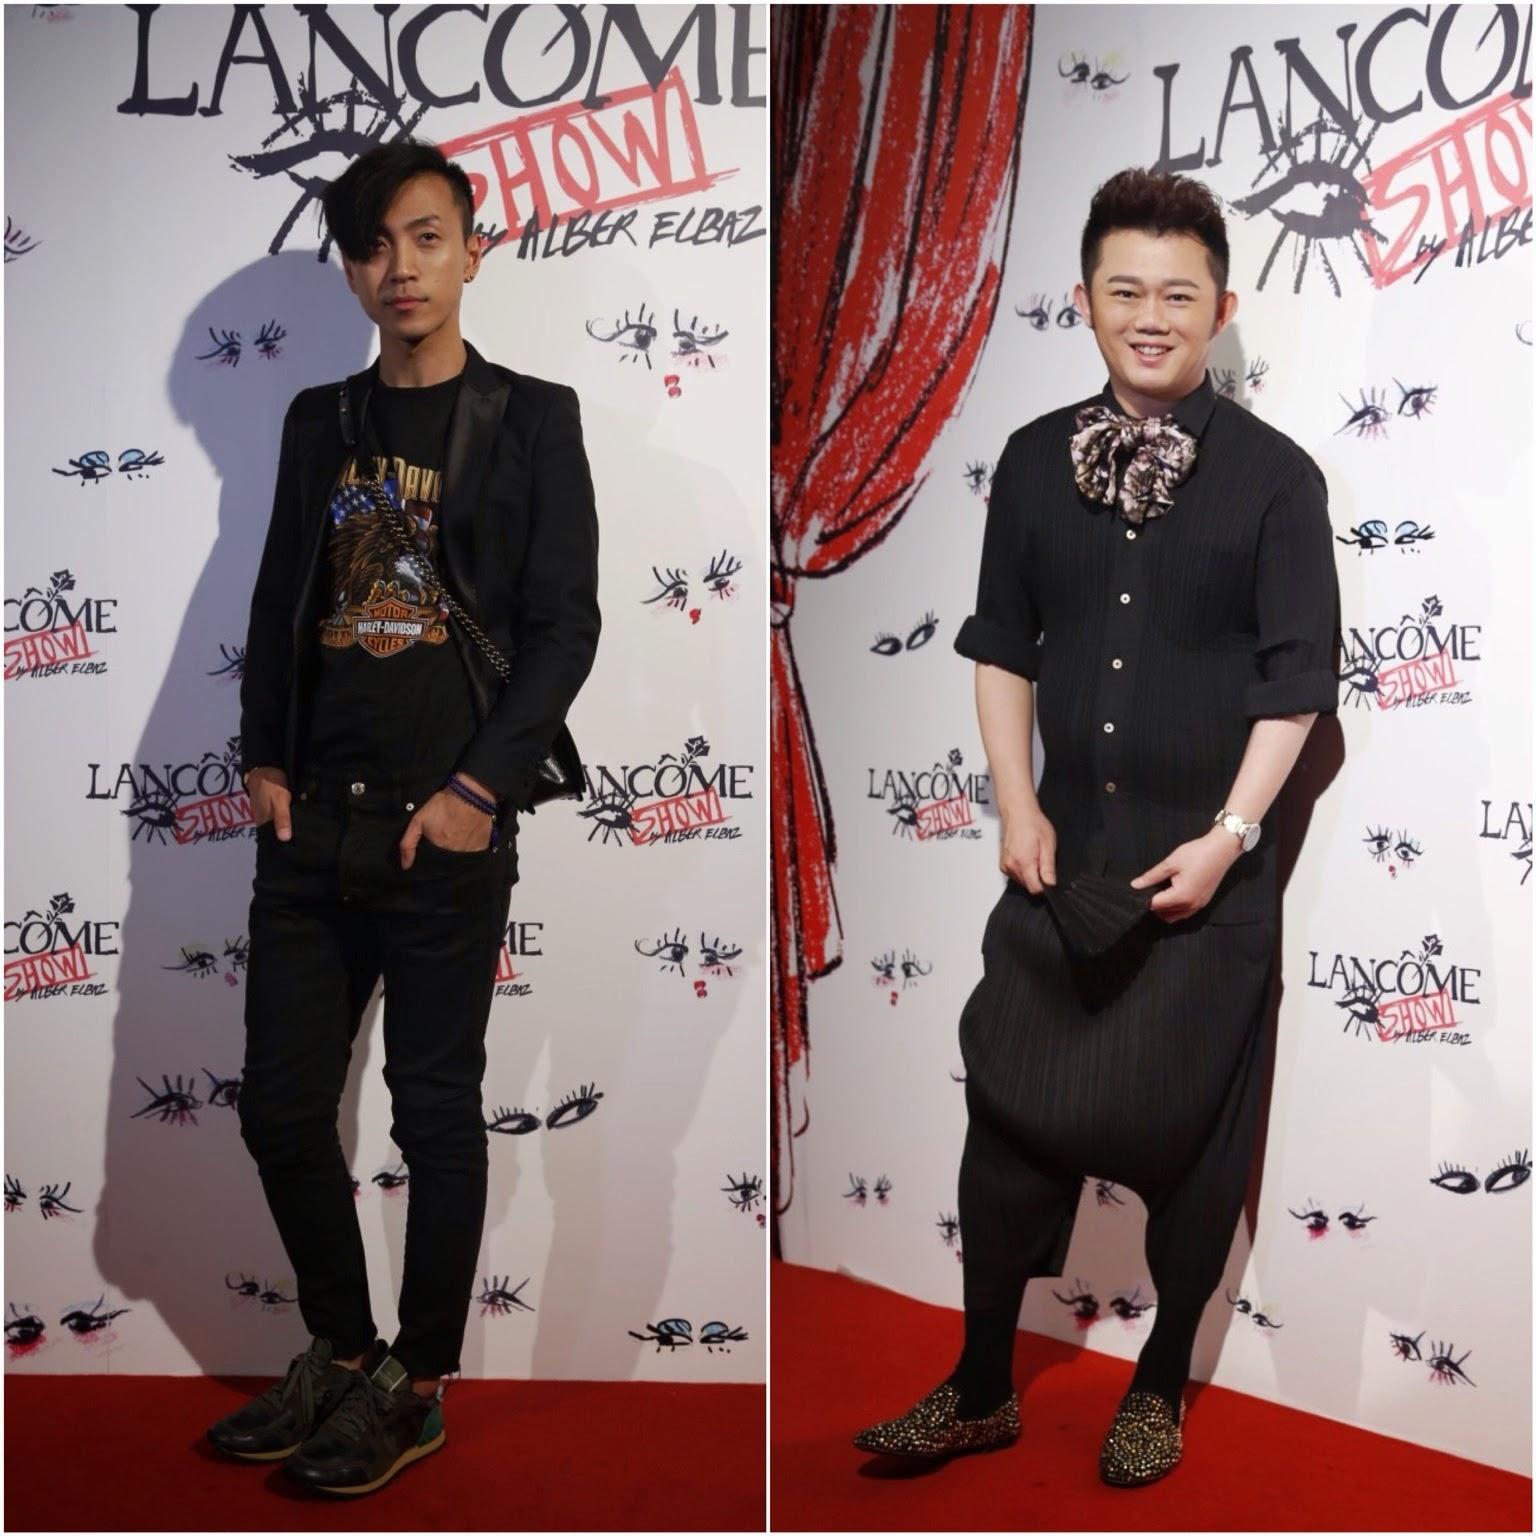 00O00 Menswear Blog Alber Elbaz x Lancôme Launch, Beijing 时尚先锋 Alber Elbaz 现身北京举办盛大时尚派对,李东田,韩火火到场助阵